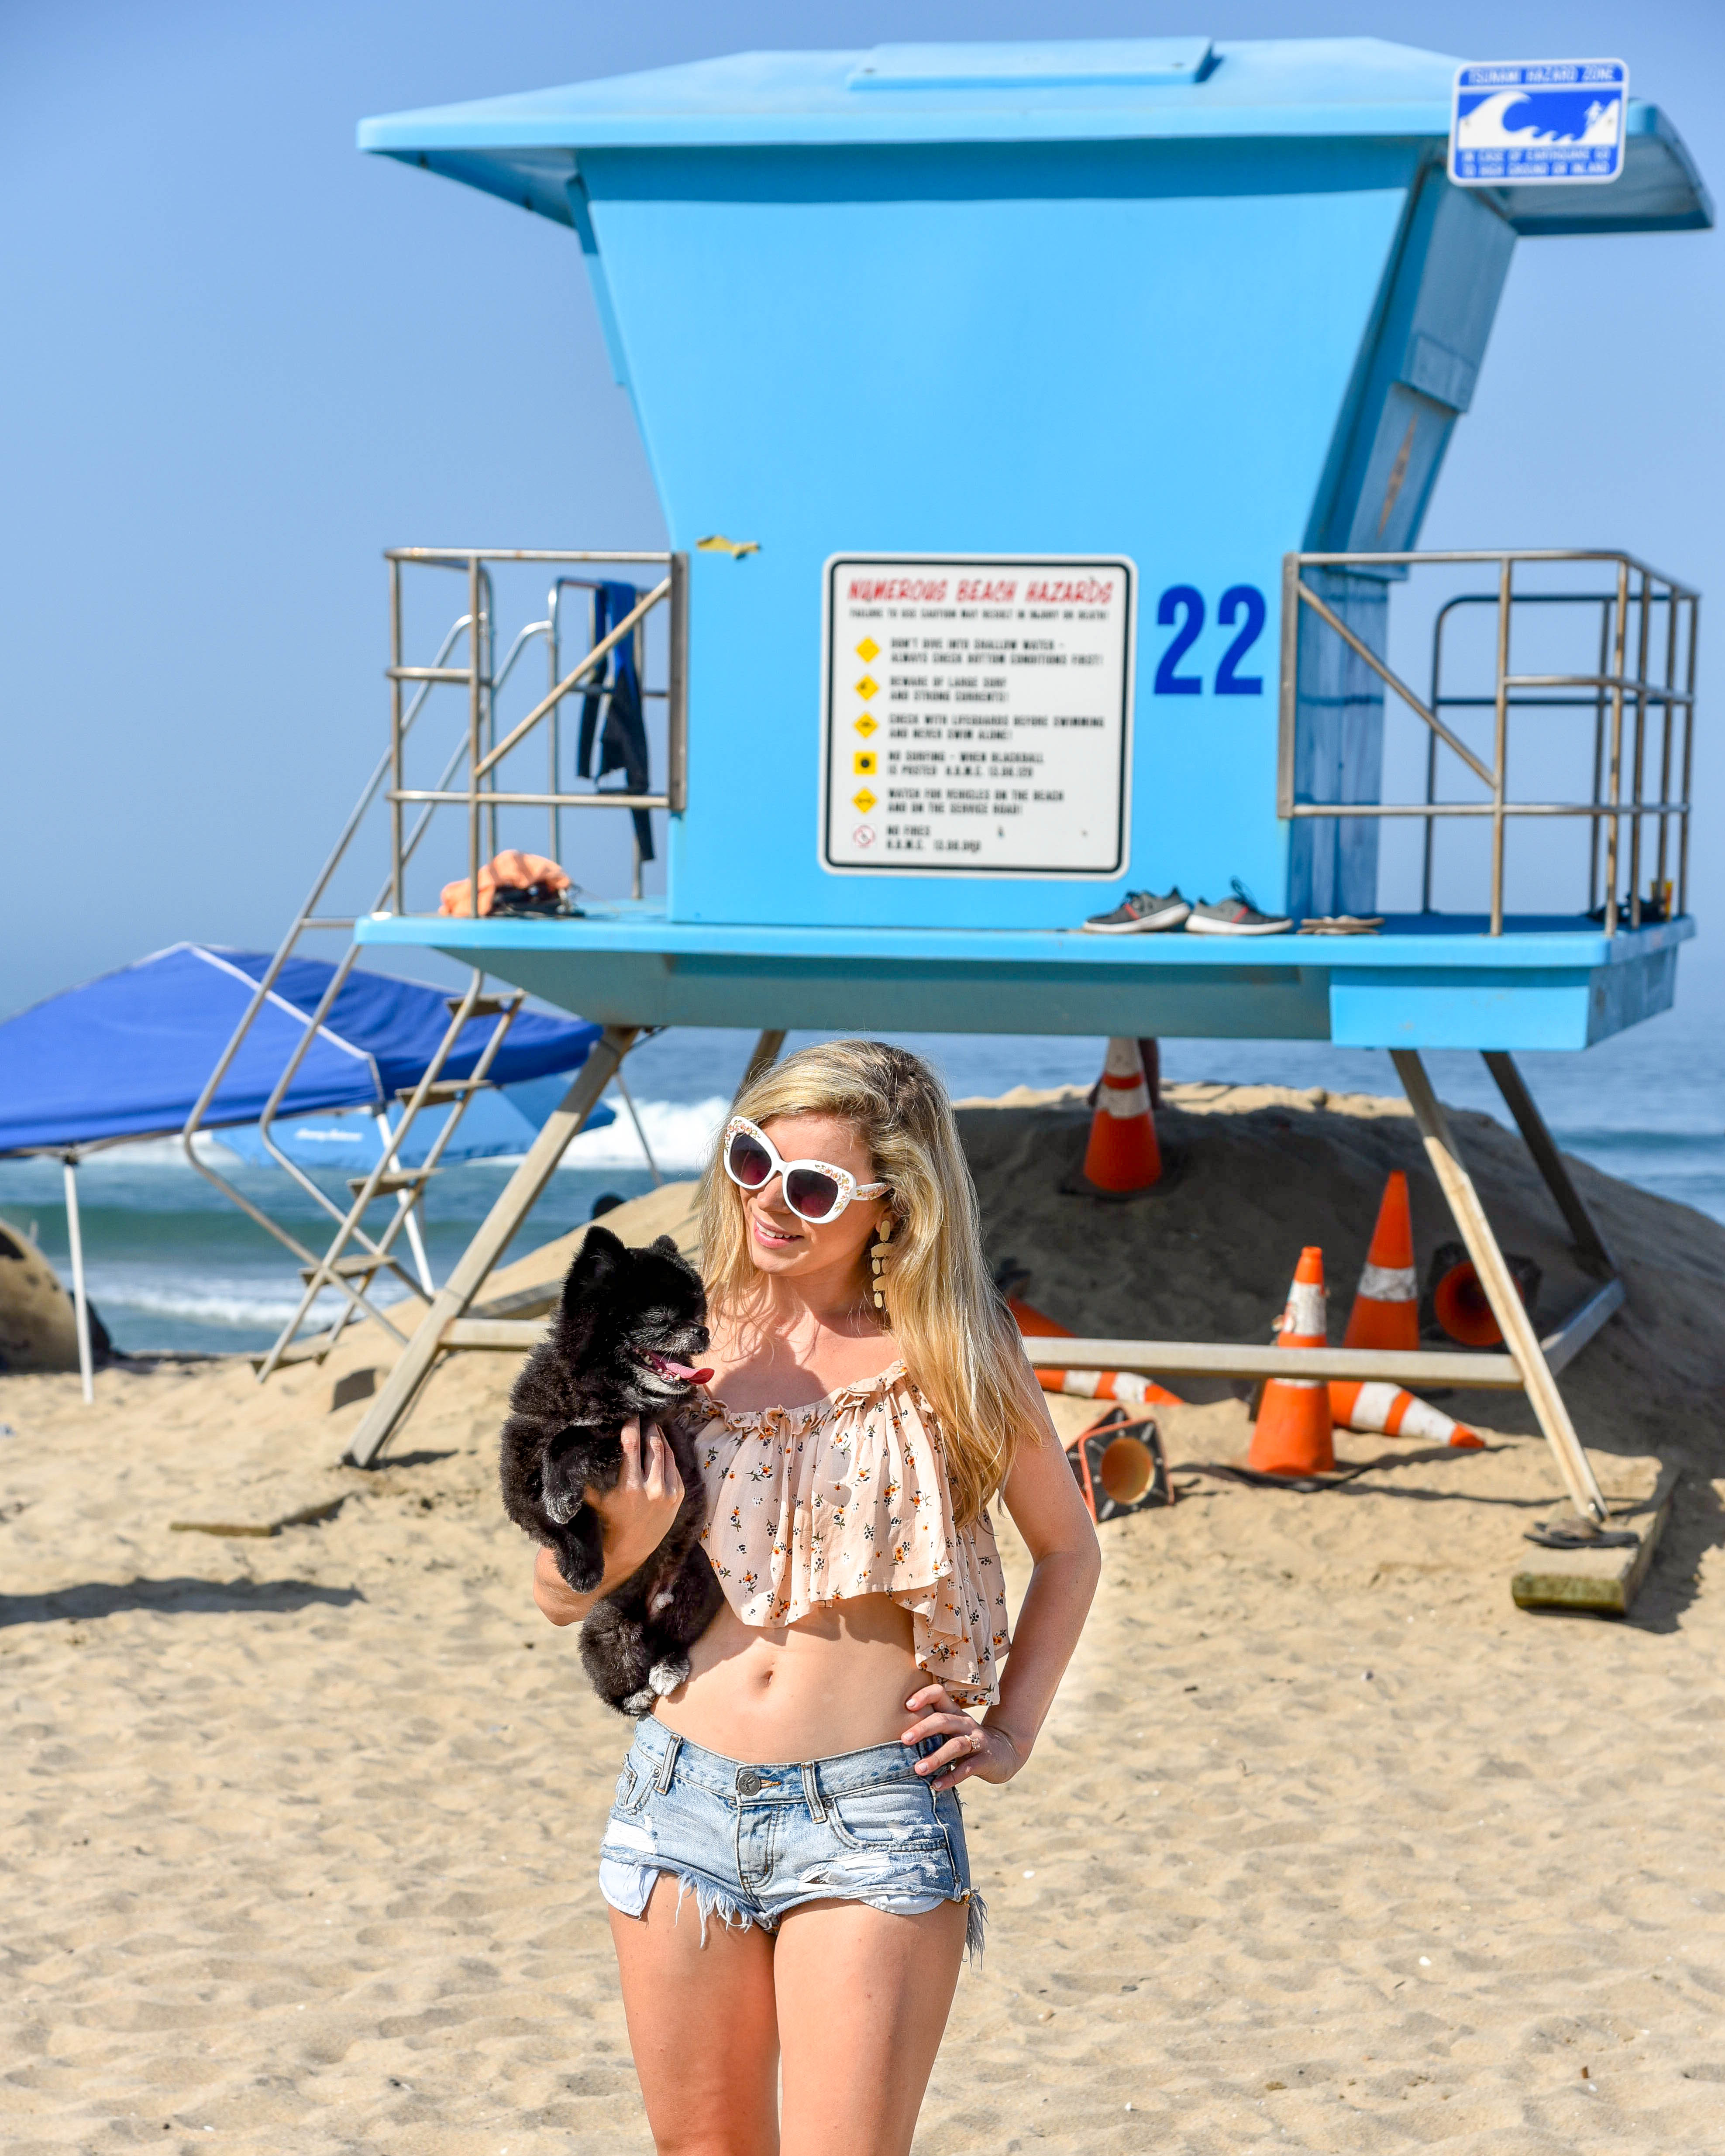 Huntington Beach Pier Surf City USA Dog Beach Travel Guide to Los Angeles California